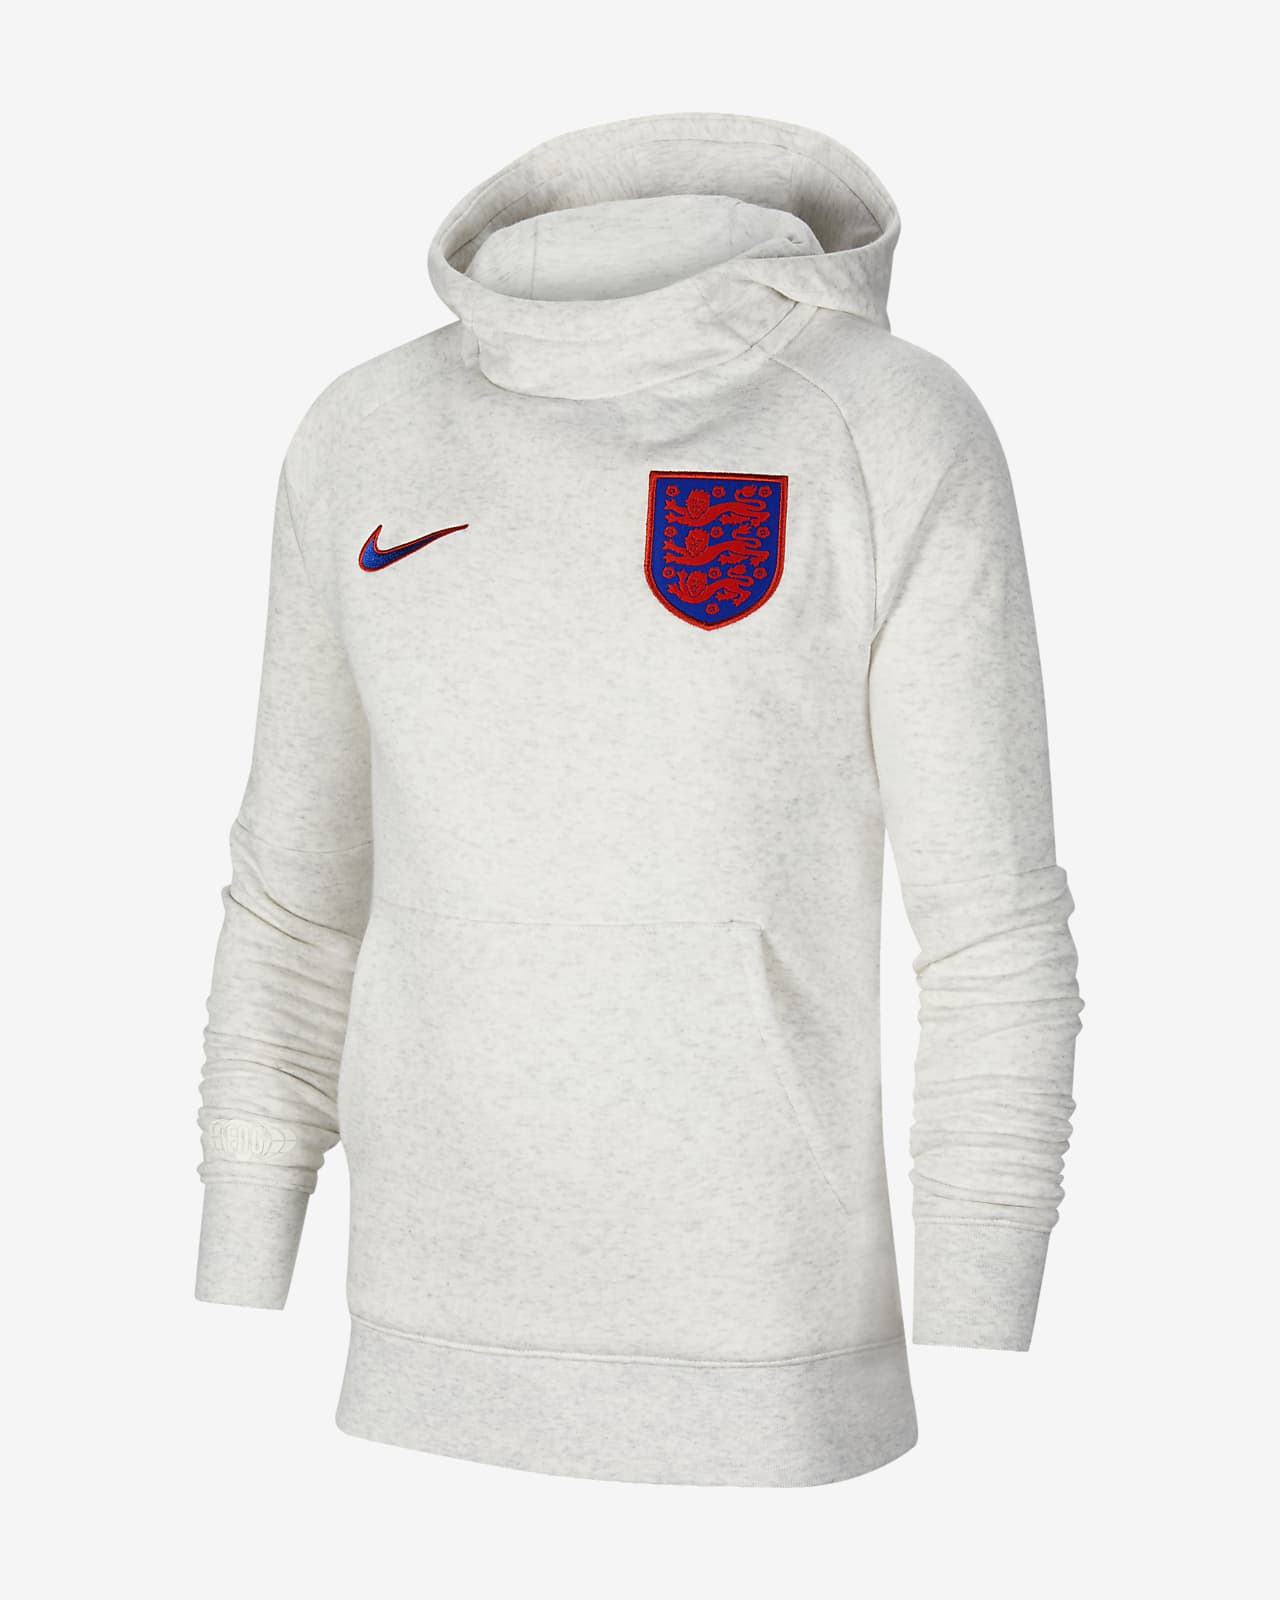 England Older Kids' Fleece Pullover Football Hoodie